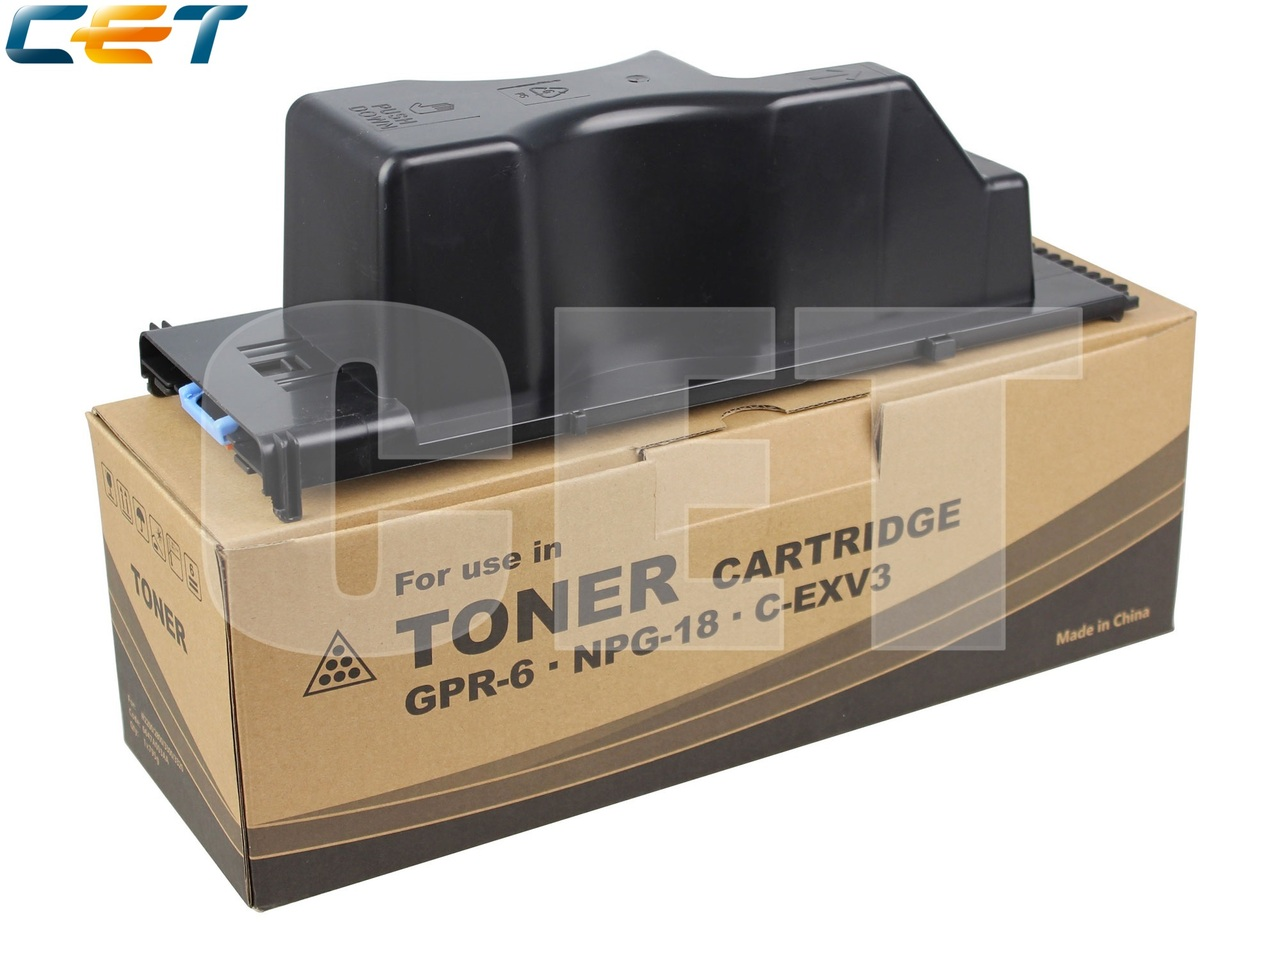 Тонер-картридж C-EXV3 для CANON iR2200/2800/3300/3320(CET), 795г, 15000 стр., CET2606